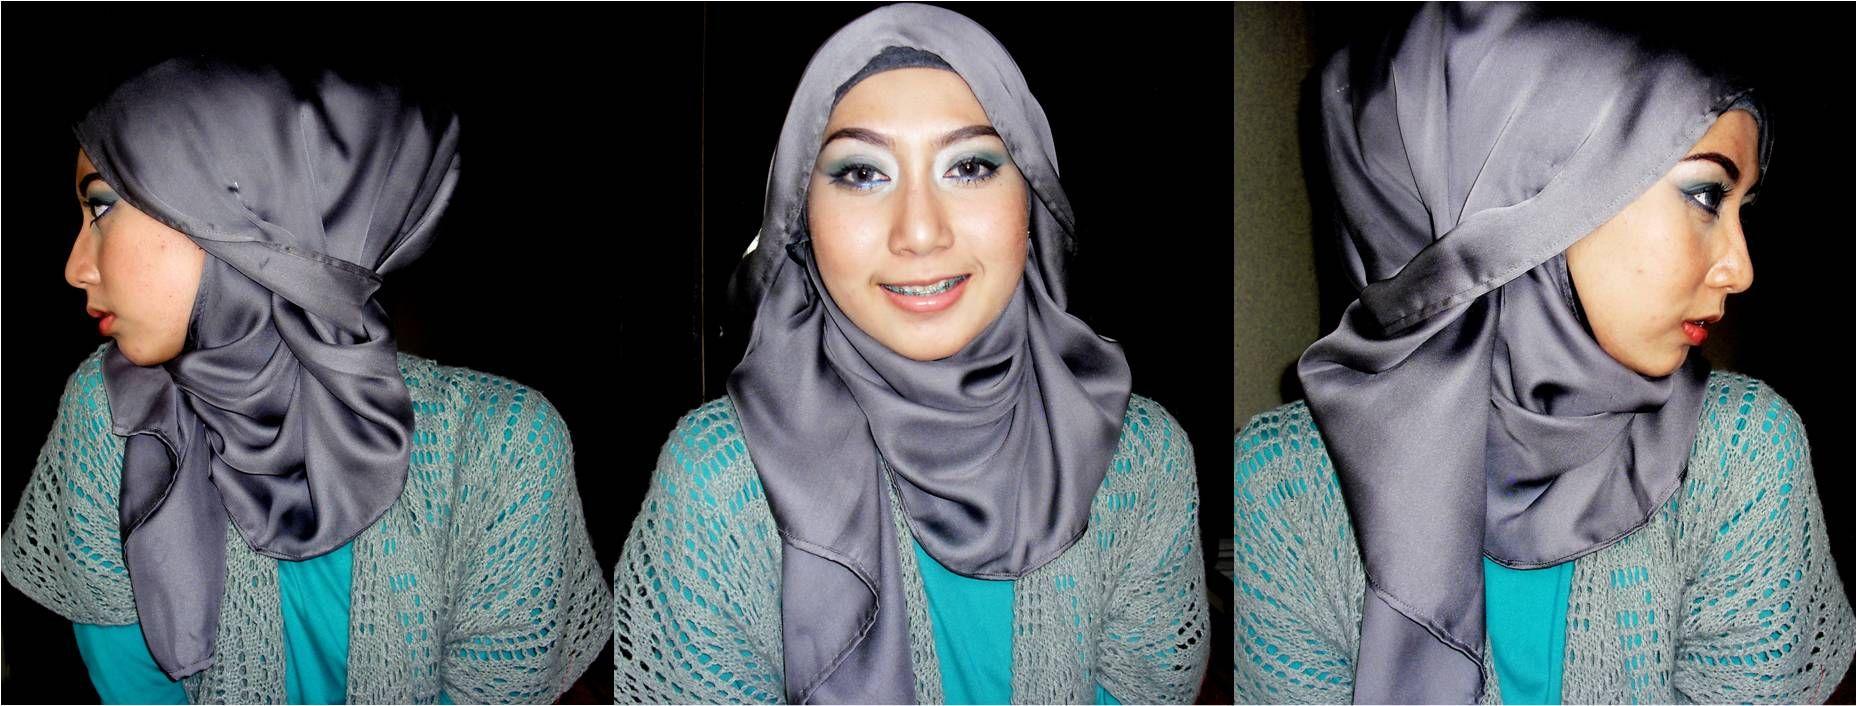 10 Cantik Tutorial Hijab Pashmina Hana Chsi Untuk Santai